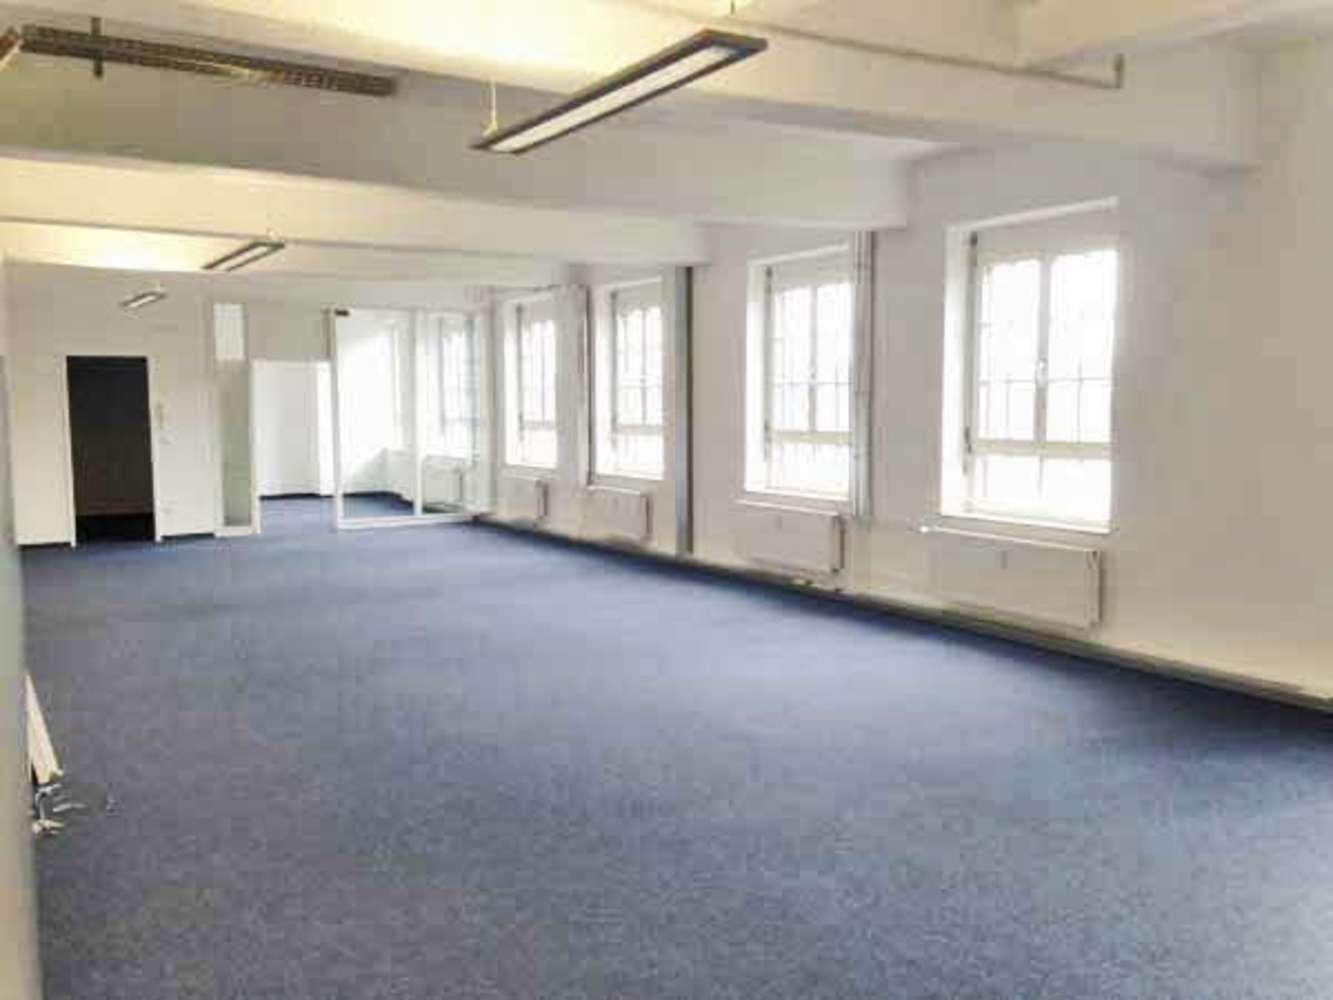 Büros Nürnberg, 90409 - Büro - Nürnberg, Großreuth h d Veste - M1312 - 10602611